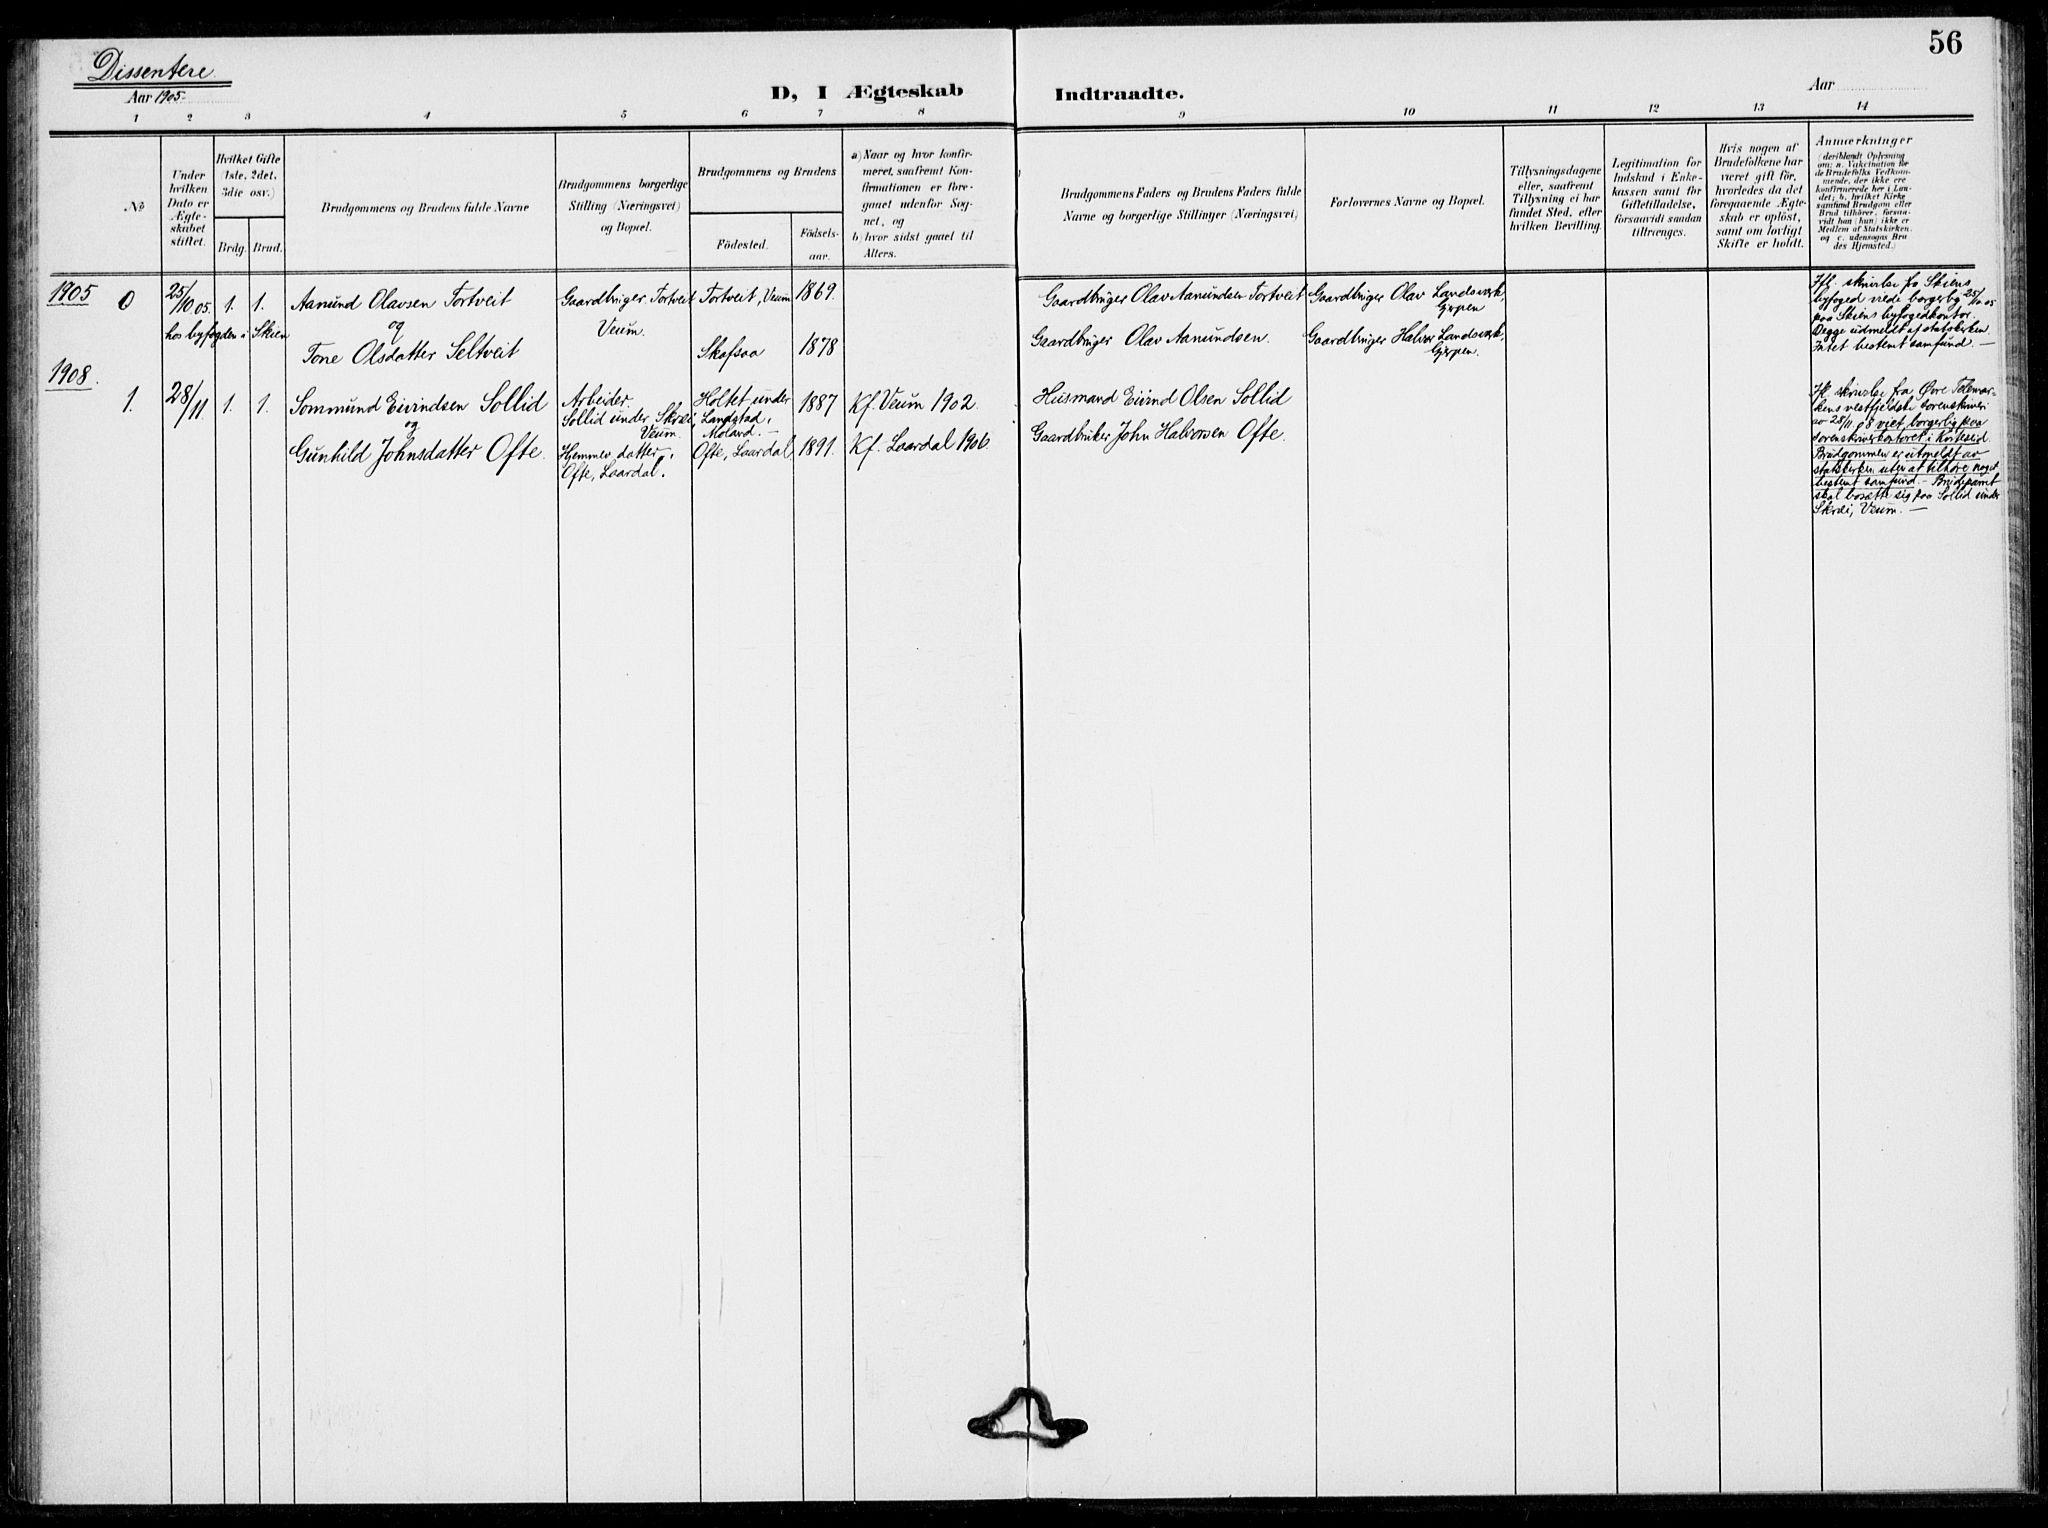 SAKO, Fyresdal kirkebøker, F/Fb/L0004: Ministerialbok nr. II 4, 1903-1920, s. 56